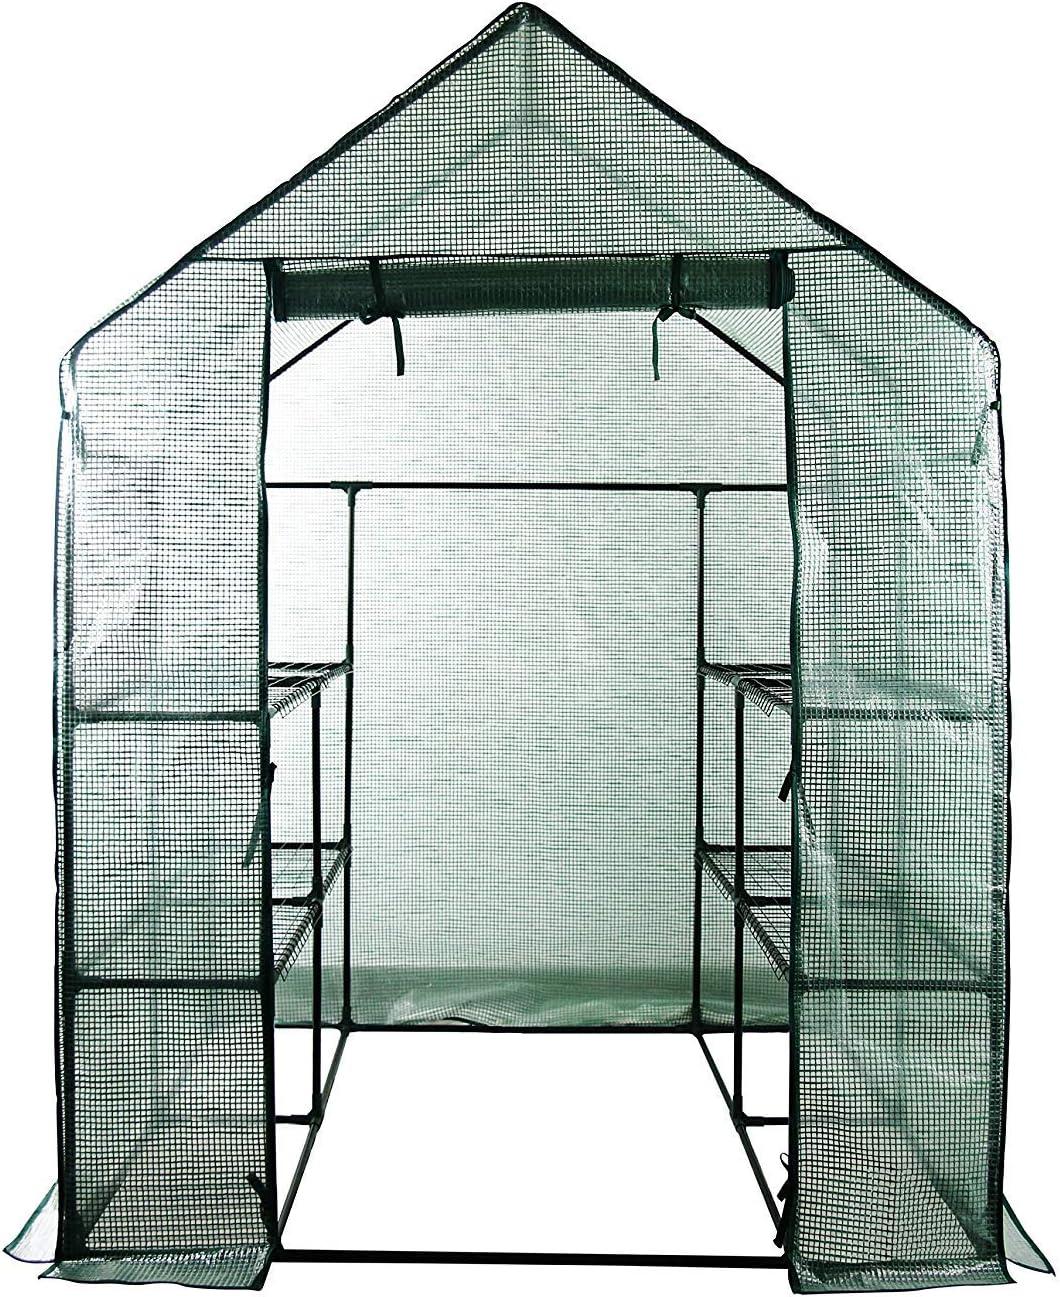 Gardman R299 Rustic Rattan Half Hive Hanging Wall Basket, 12 Wide x 10 Deep